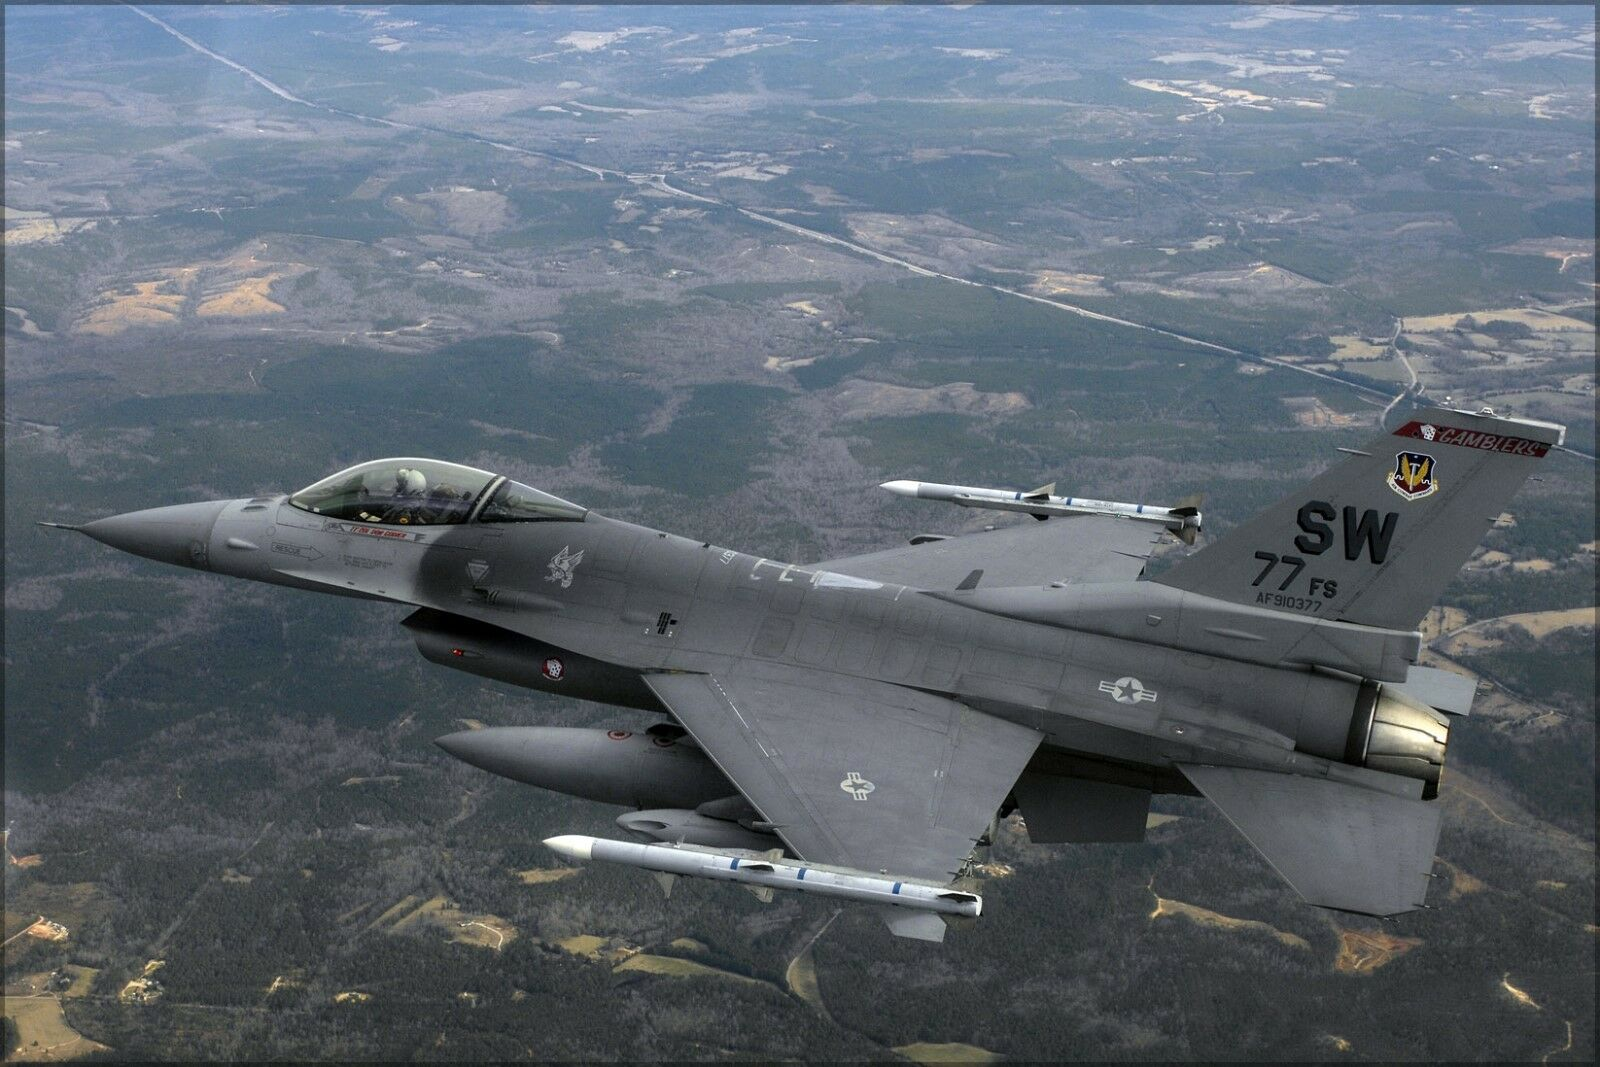 Plakat, Viele Größen; F-16cj Fighting